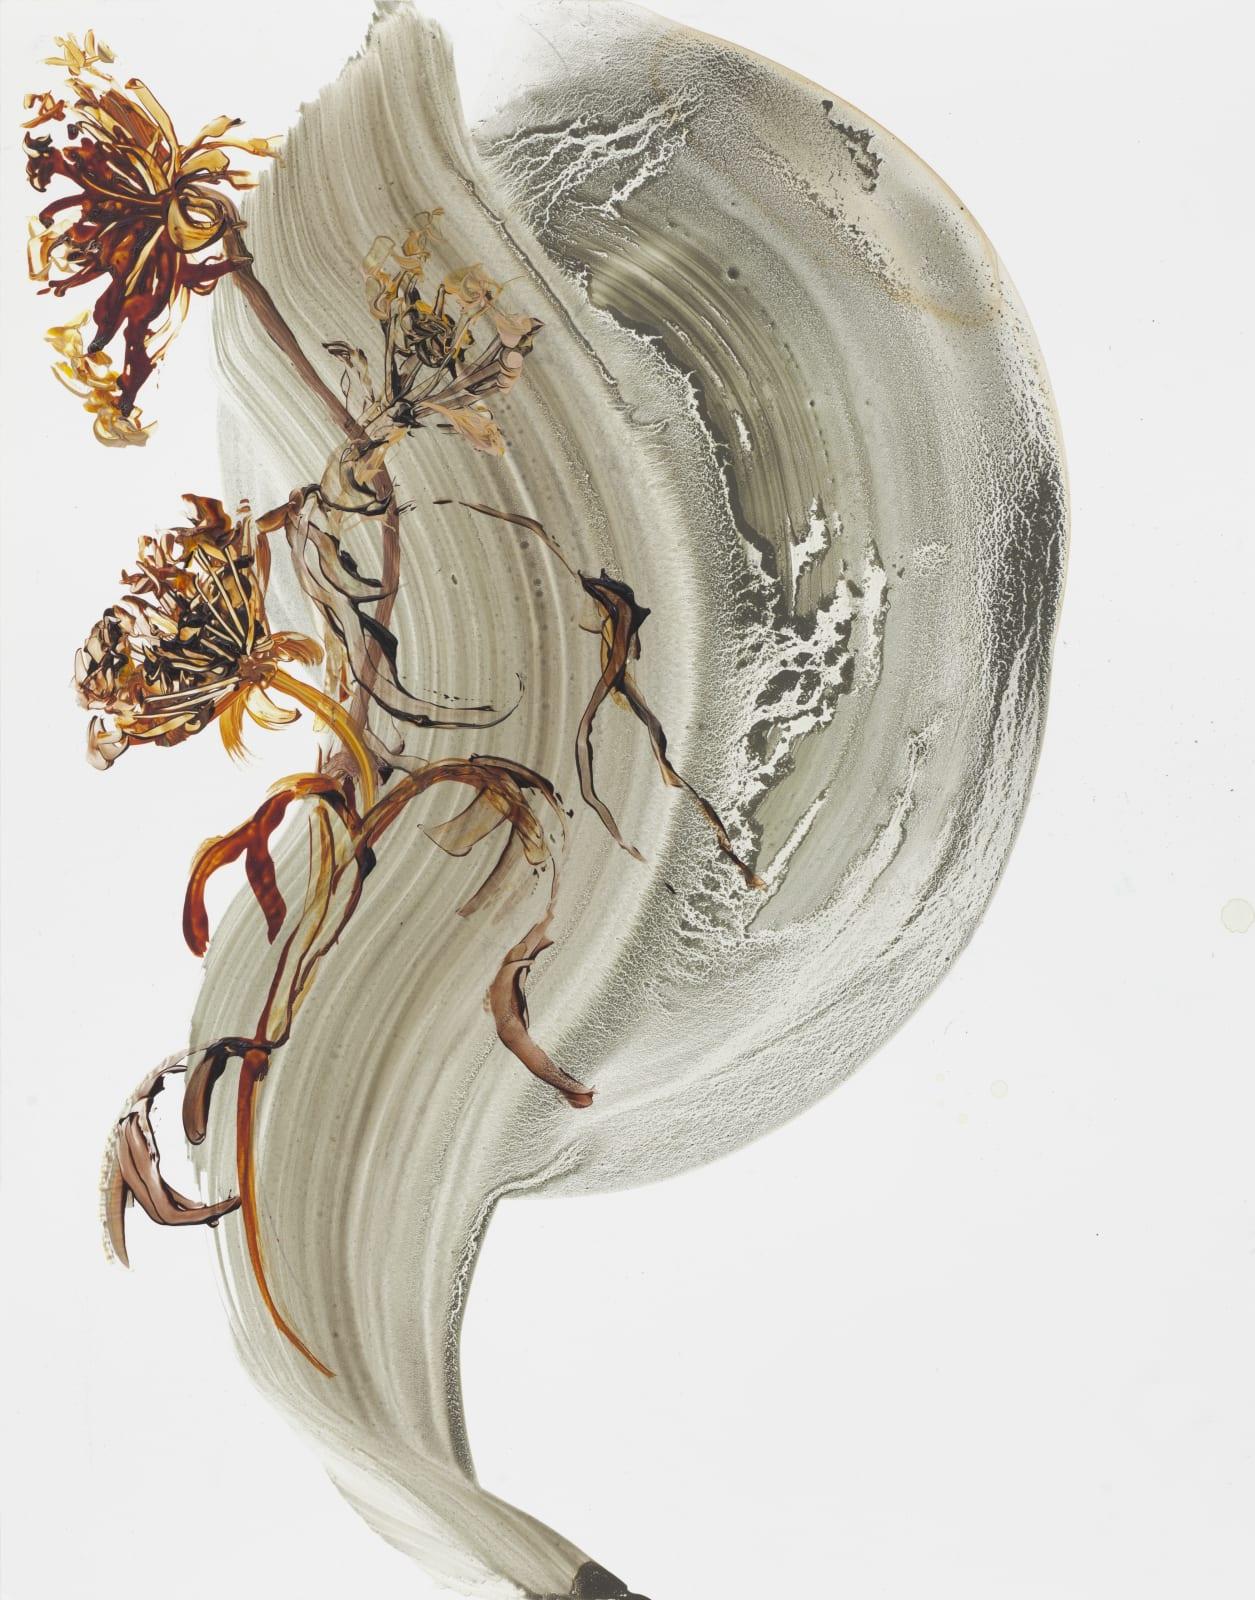 Metamorphosis acrylic on yupo paper on board 35cm x 27cm